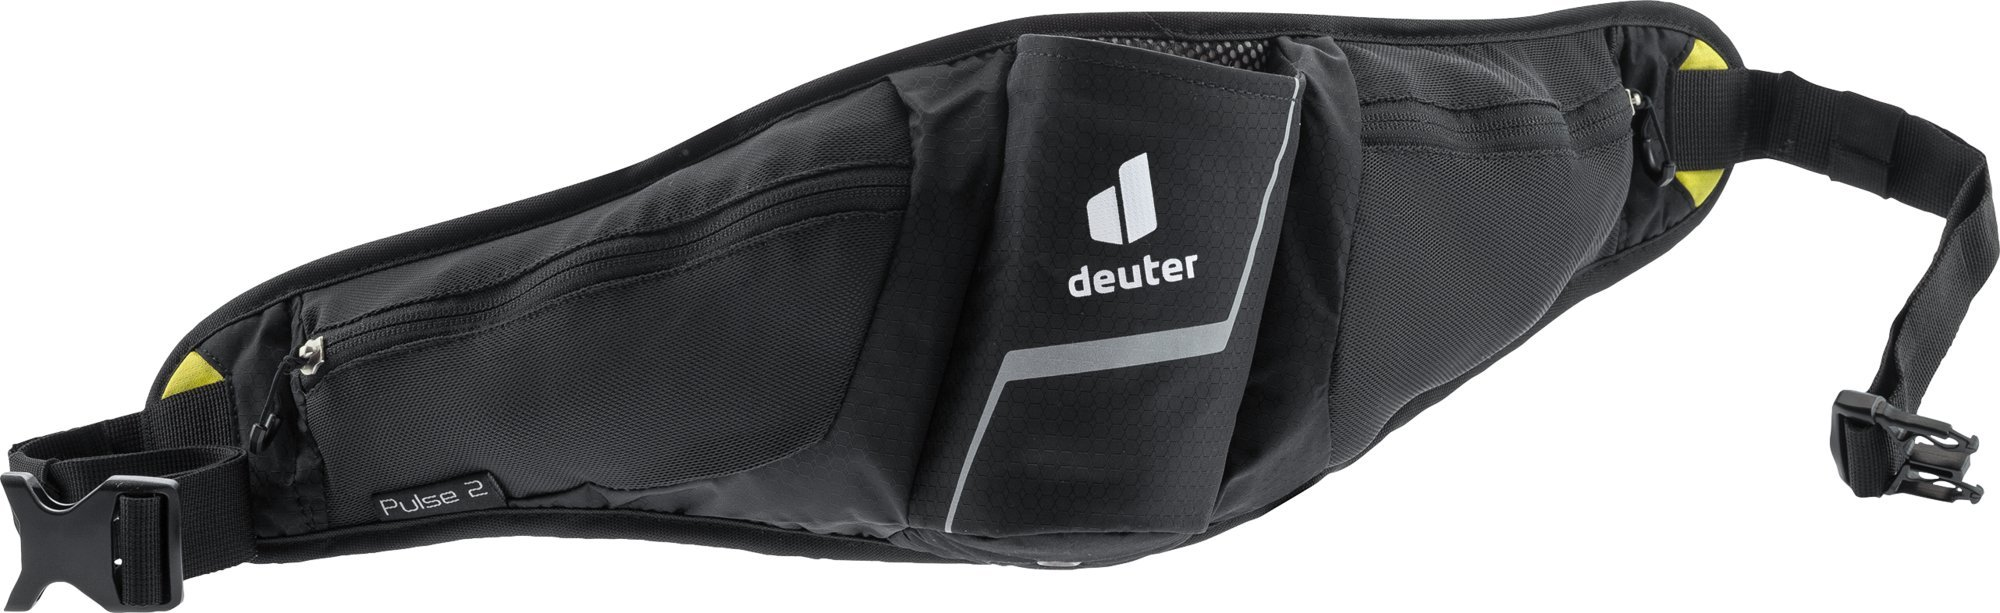 Сумки для бега Сумка поясная Deuter Pulse 2 (2021) 3910221-7000-Pulse2_black-D-02.jpg